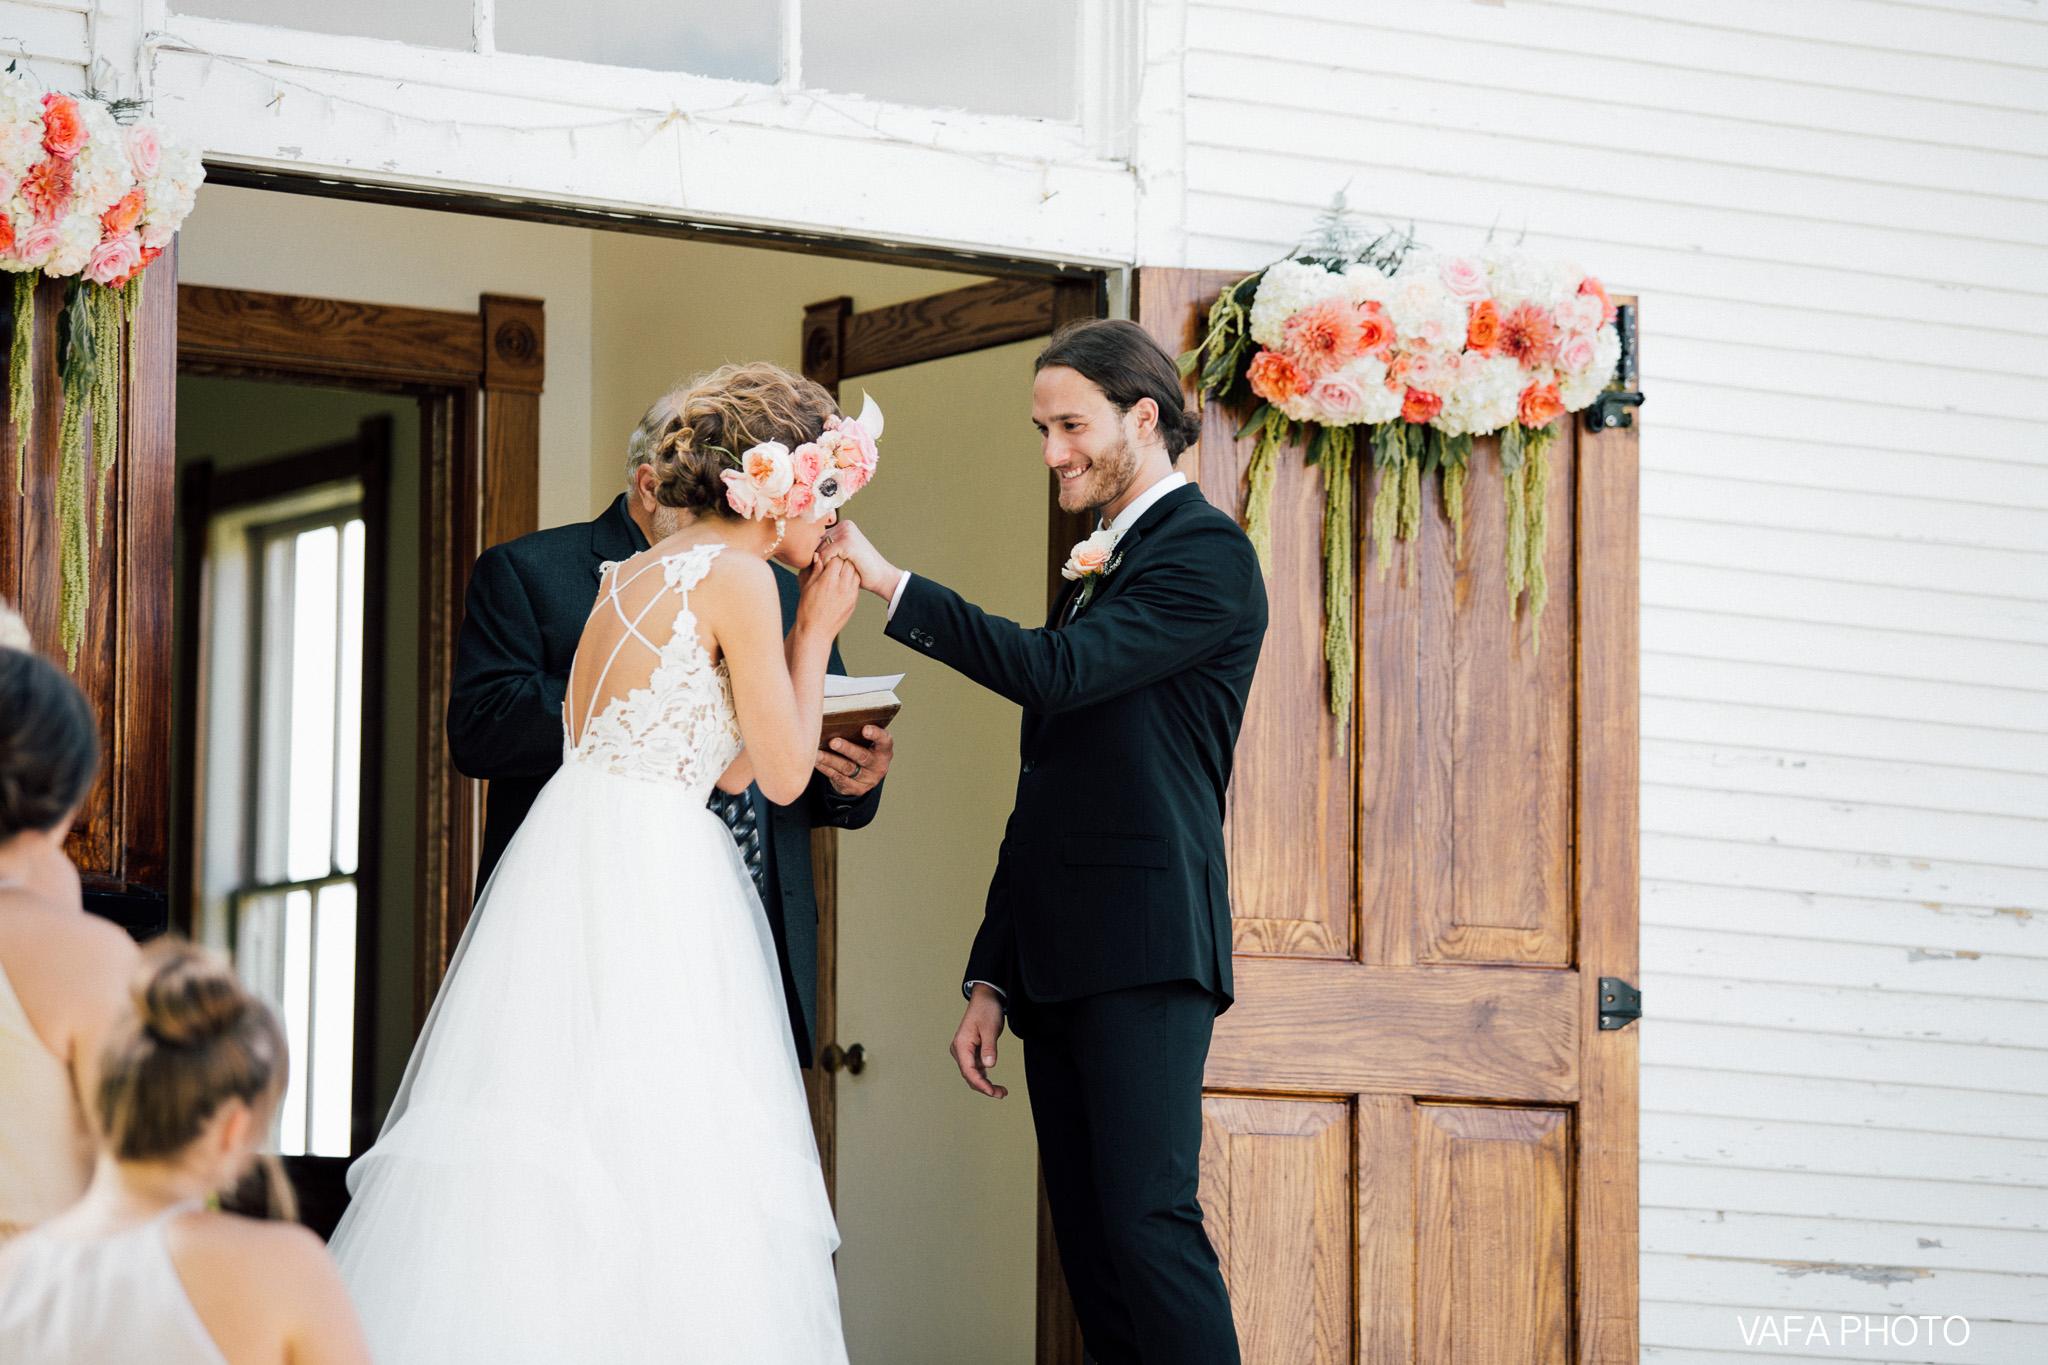 The-Felt-Estate-Wedding-Kailie-David-Vafa-Photo-369.jpg